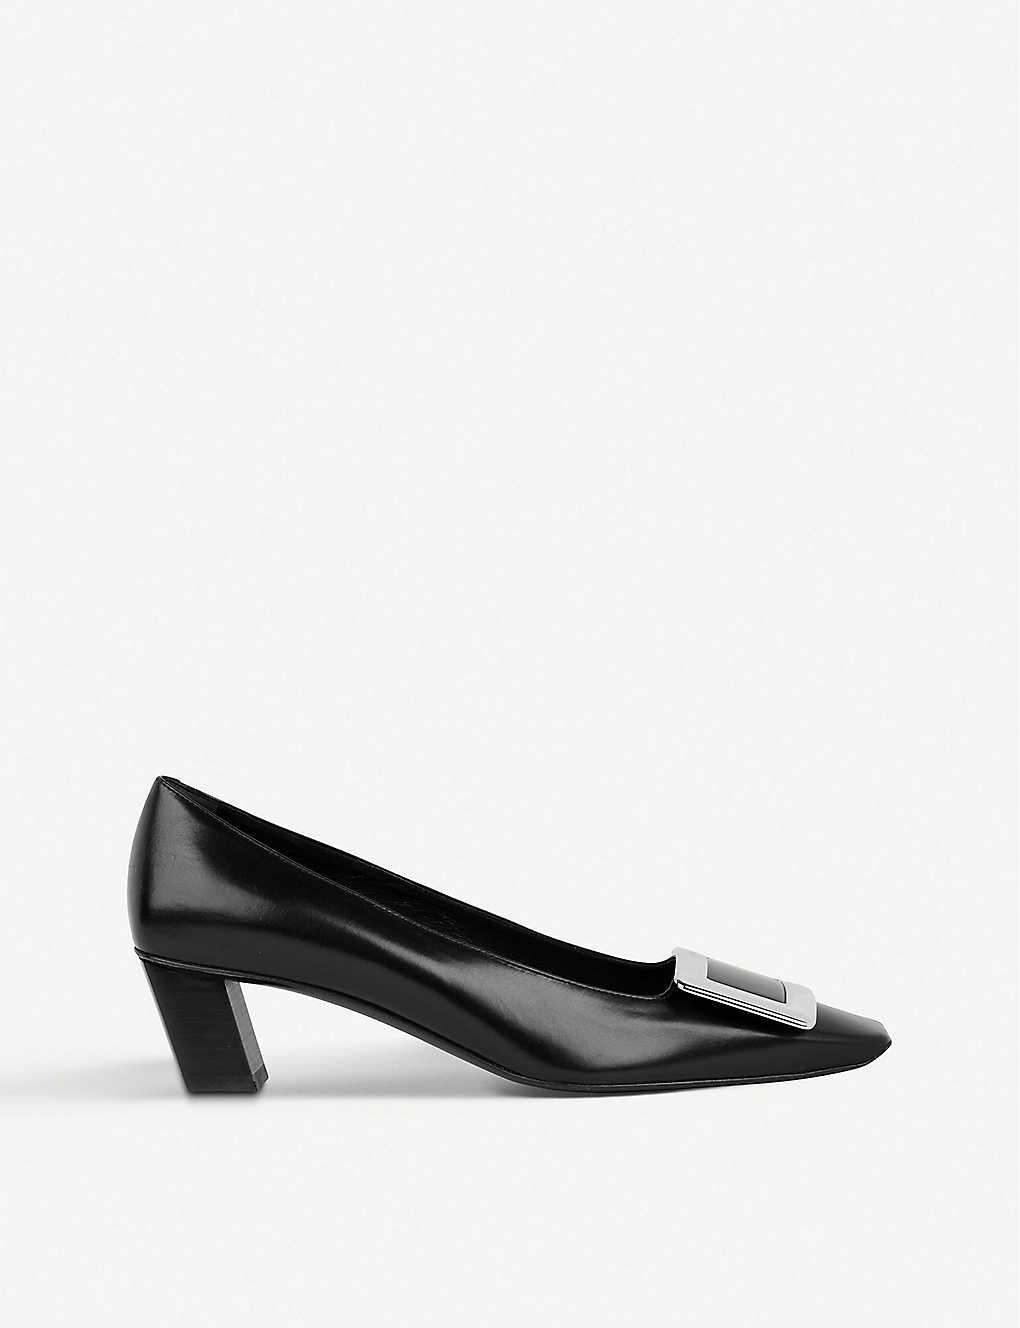 Belle Vivier patent-leather courts(2776944)